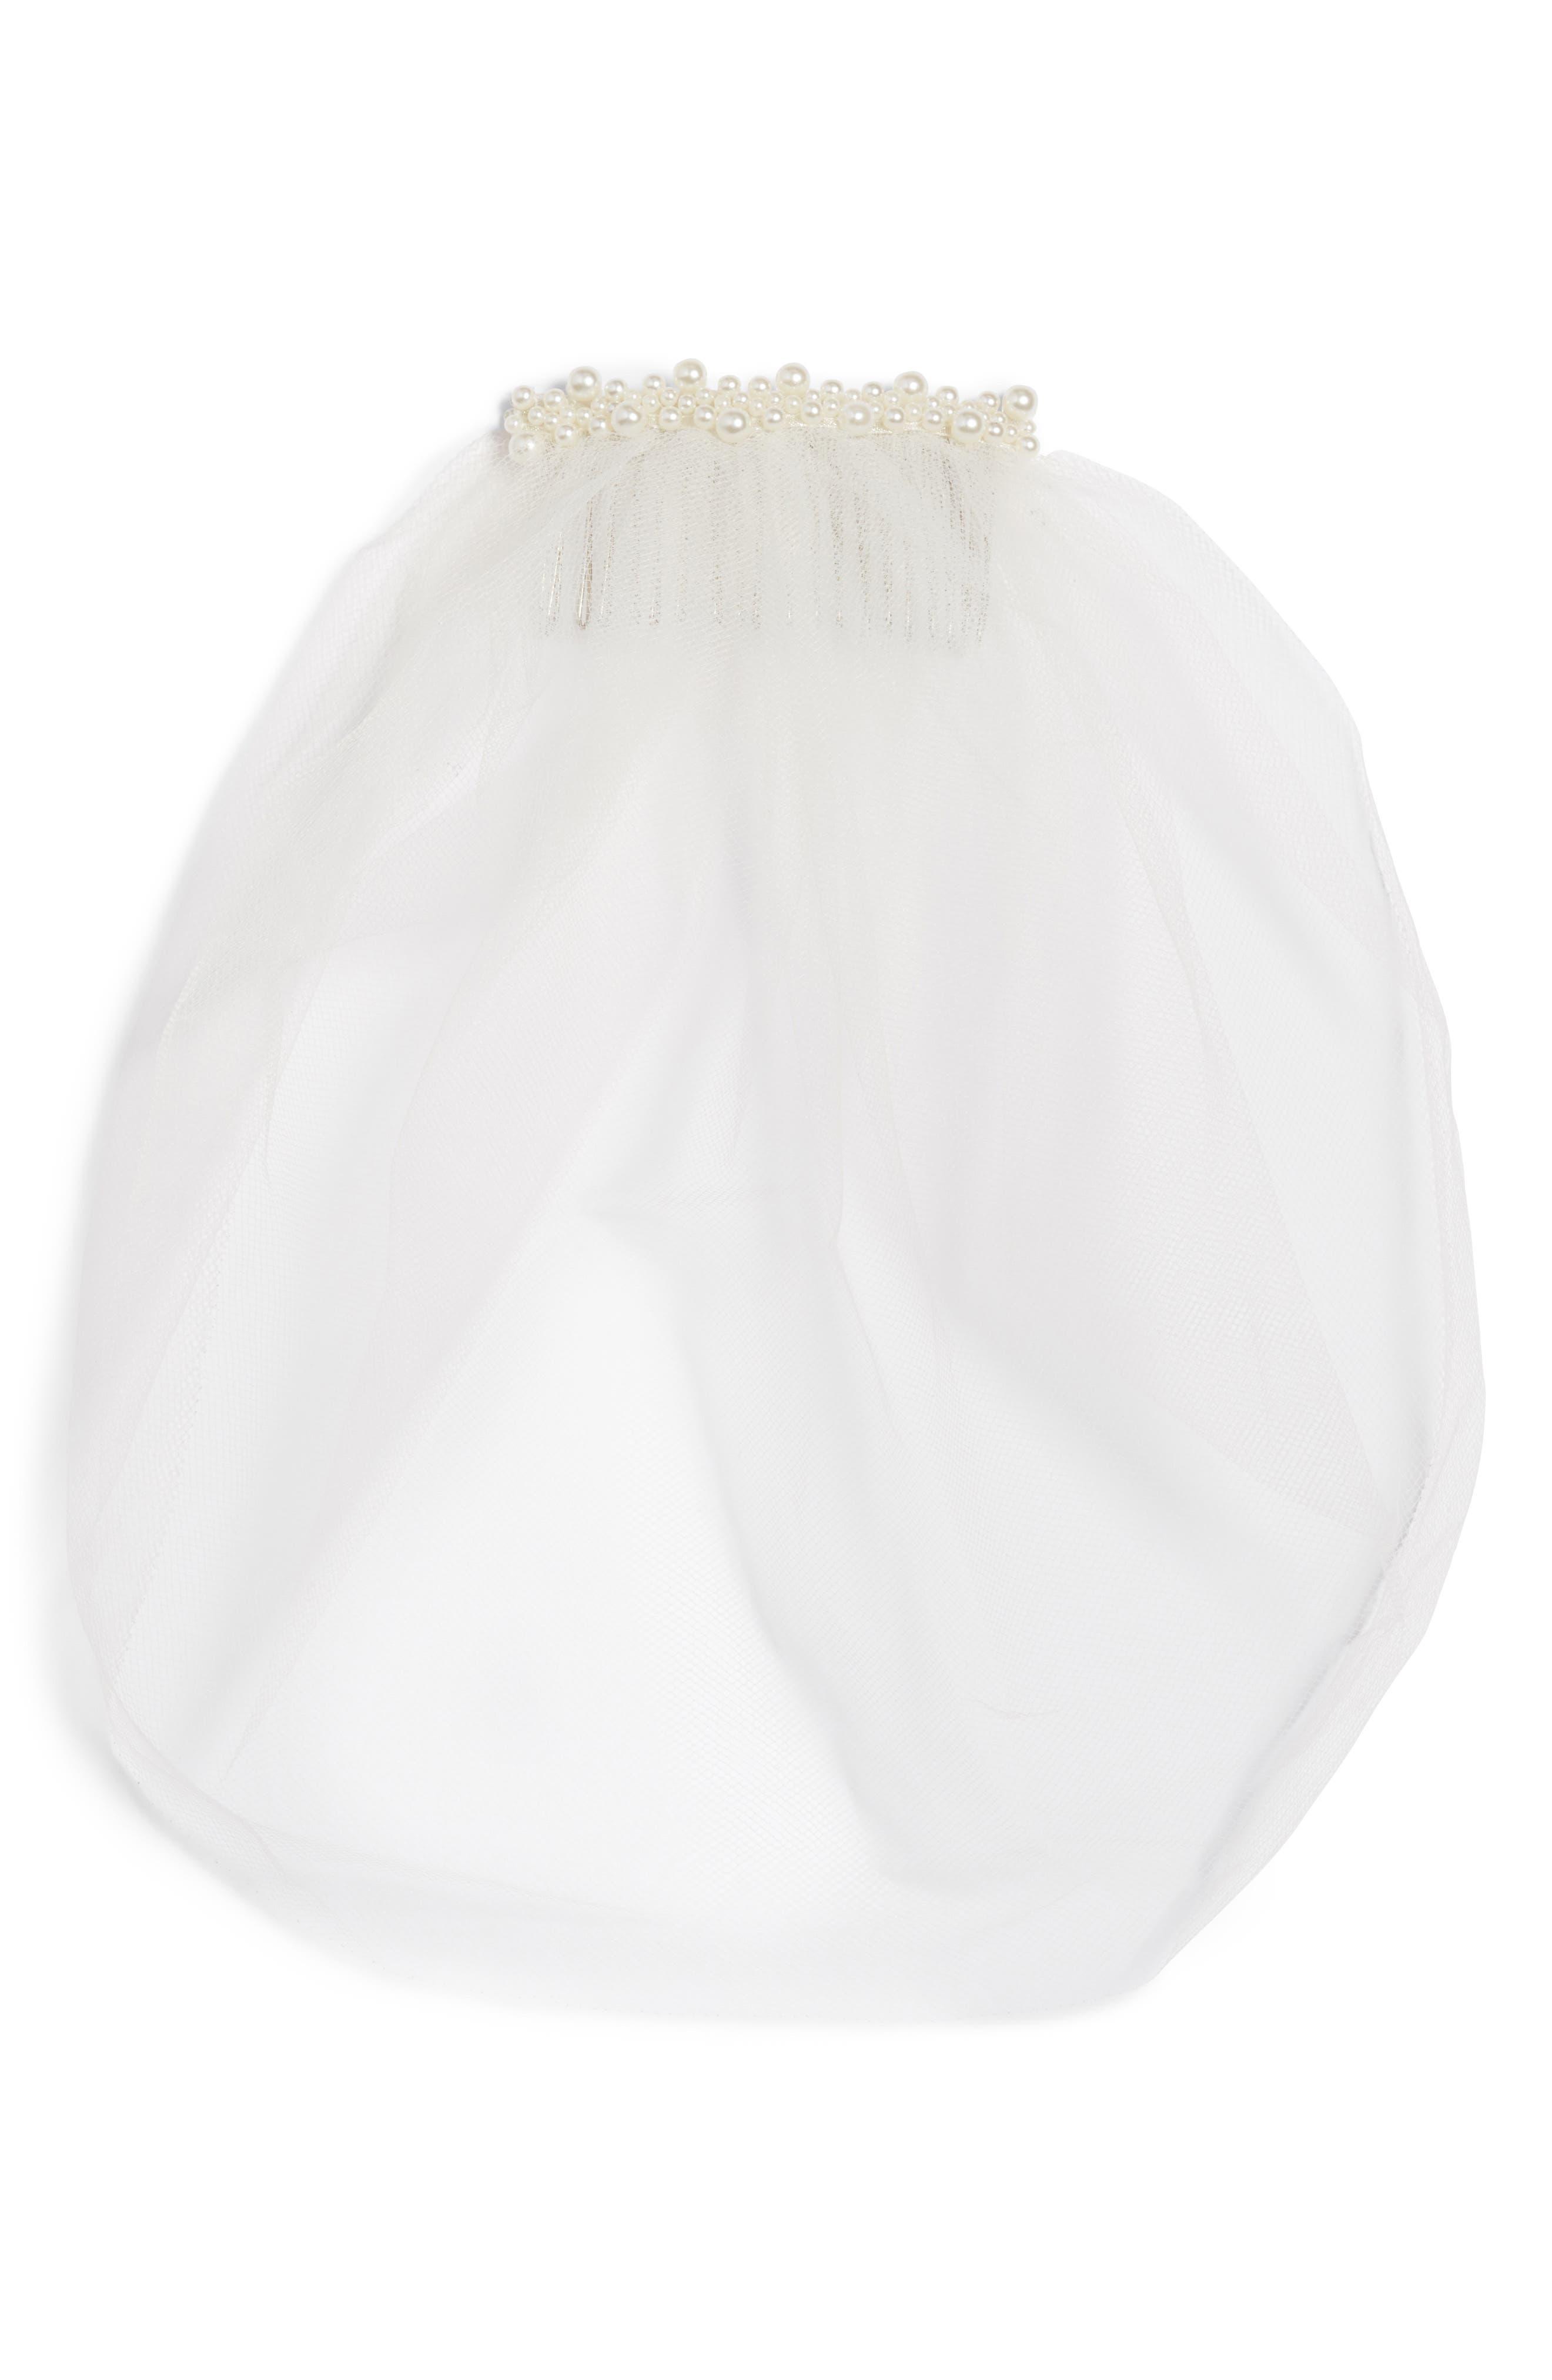 Alternate Image 2  - J-Picone Bridal Veil Hair Comb